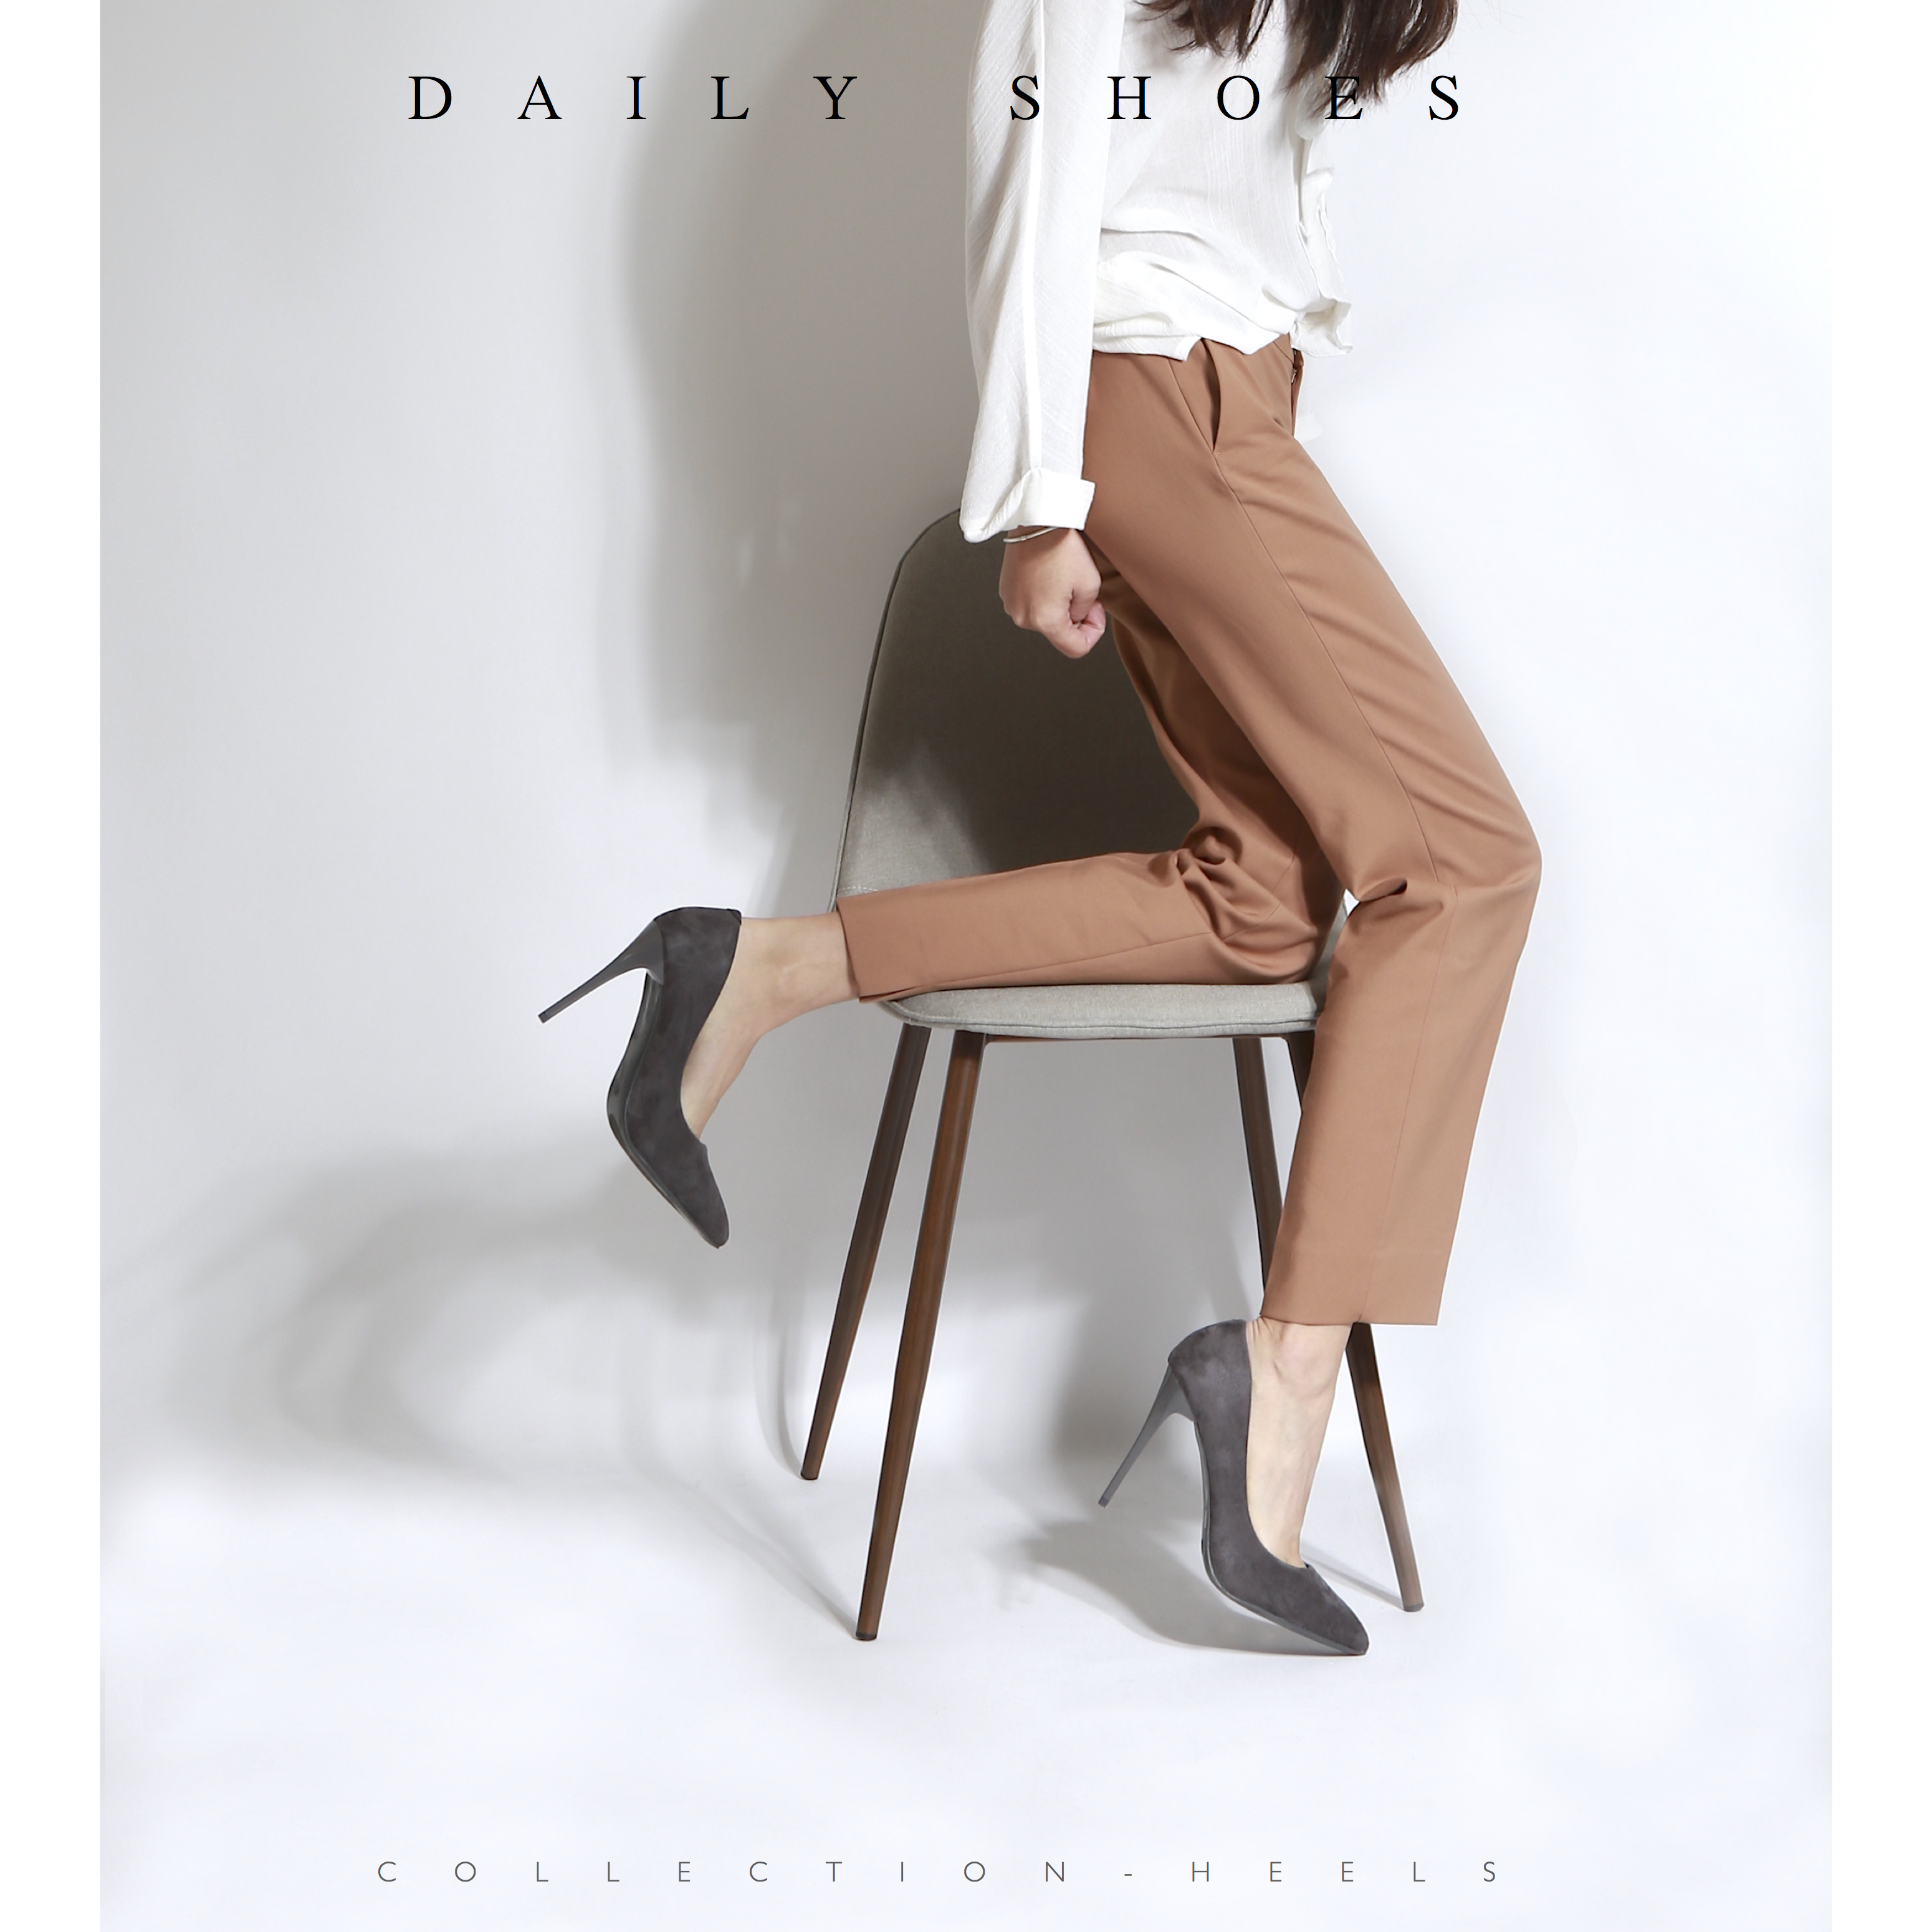 DailyShoes Women's Classic Fashion Stiletto Pointed Toe Paris-01 High Heel Dress Pump Shoes